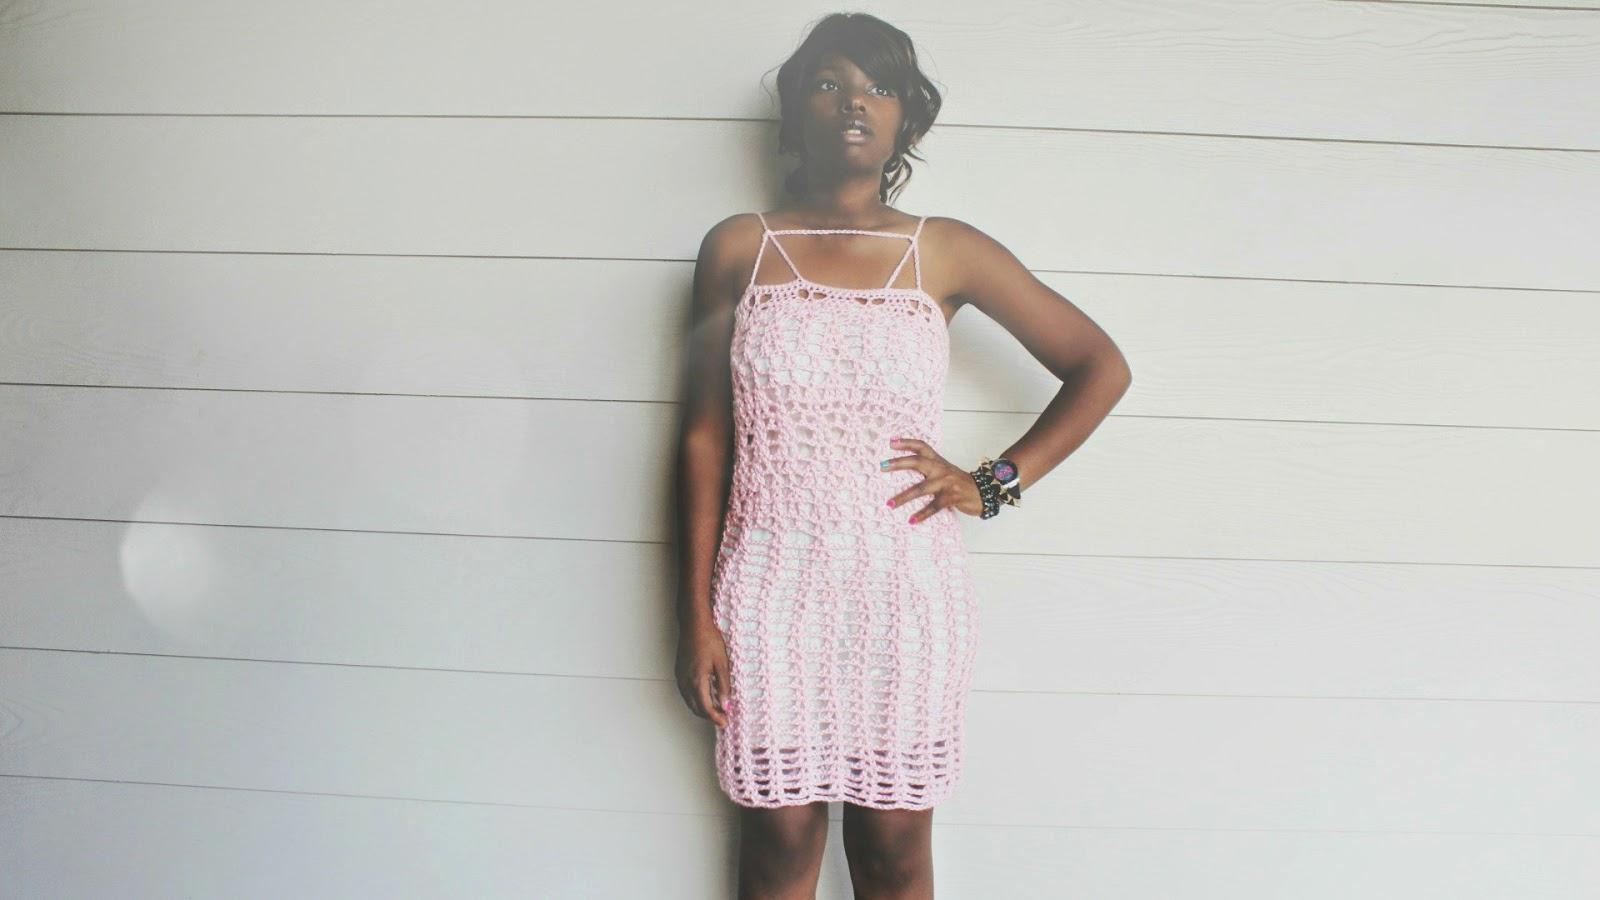 The Crossed Crochet Dress